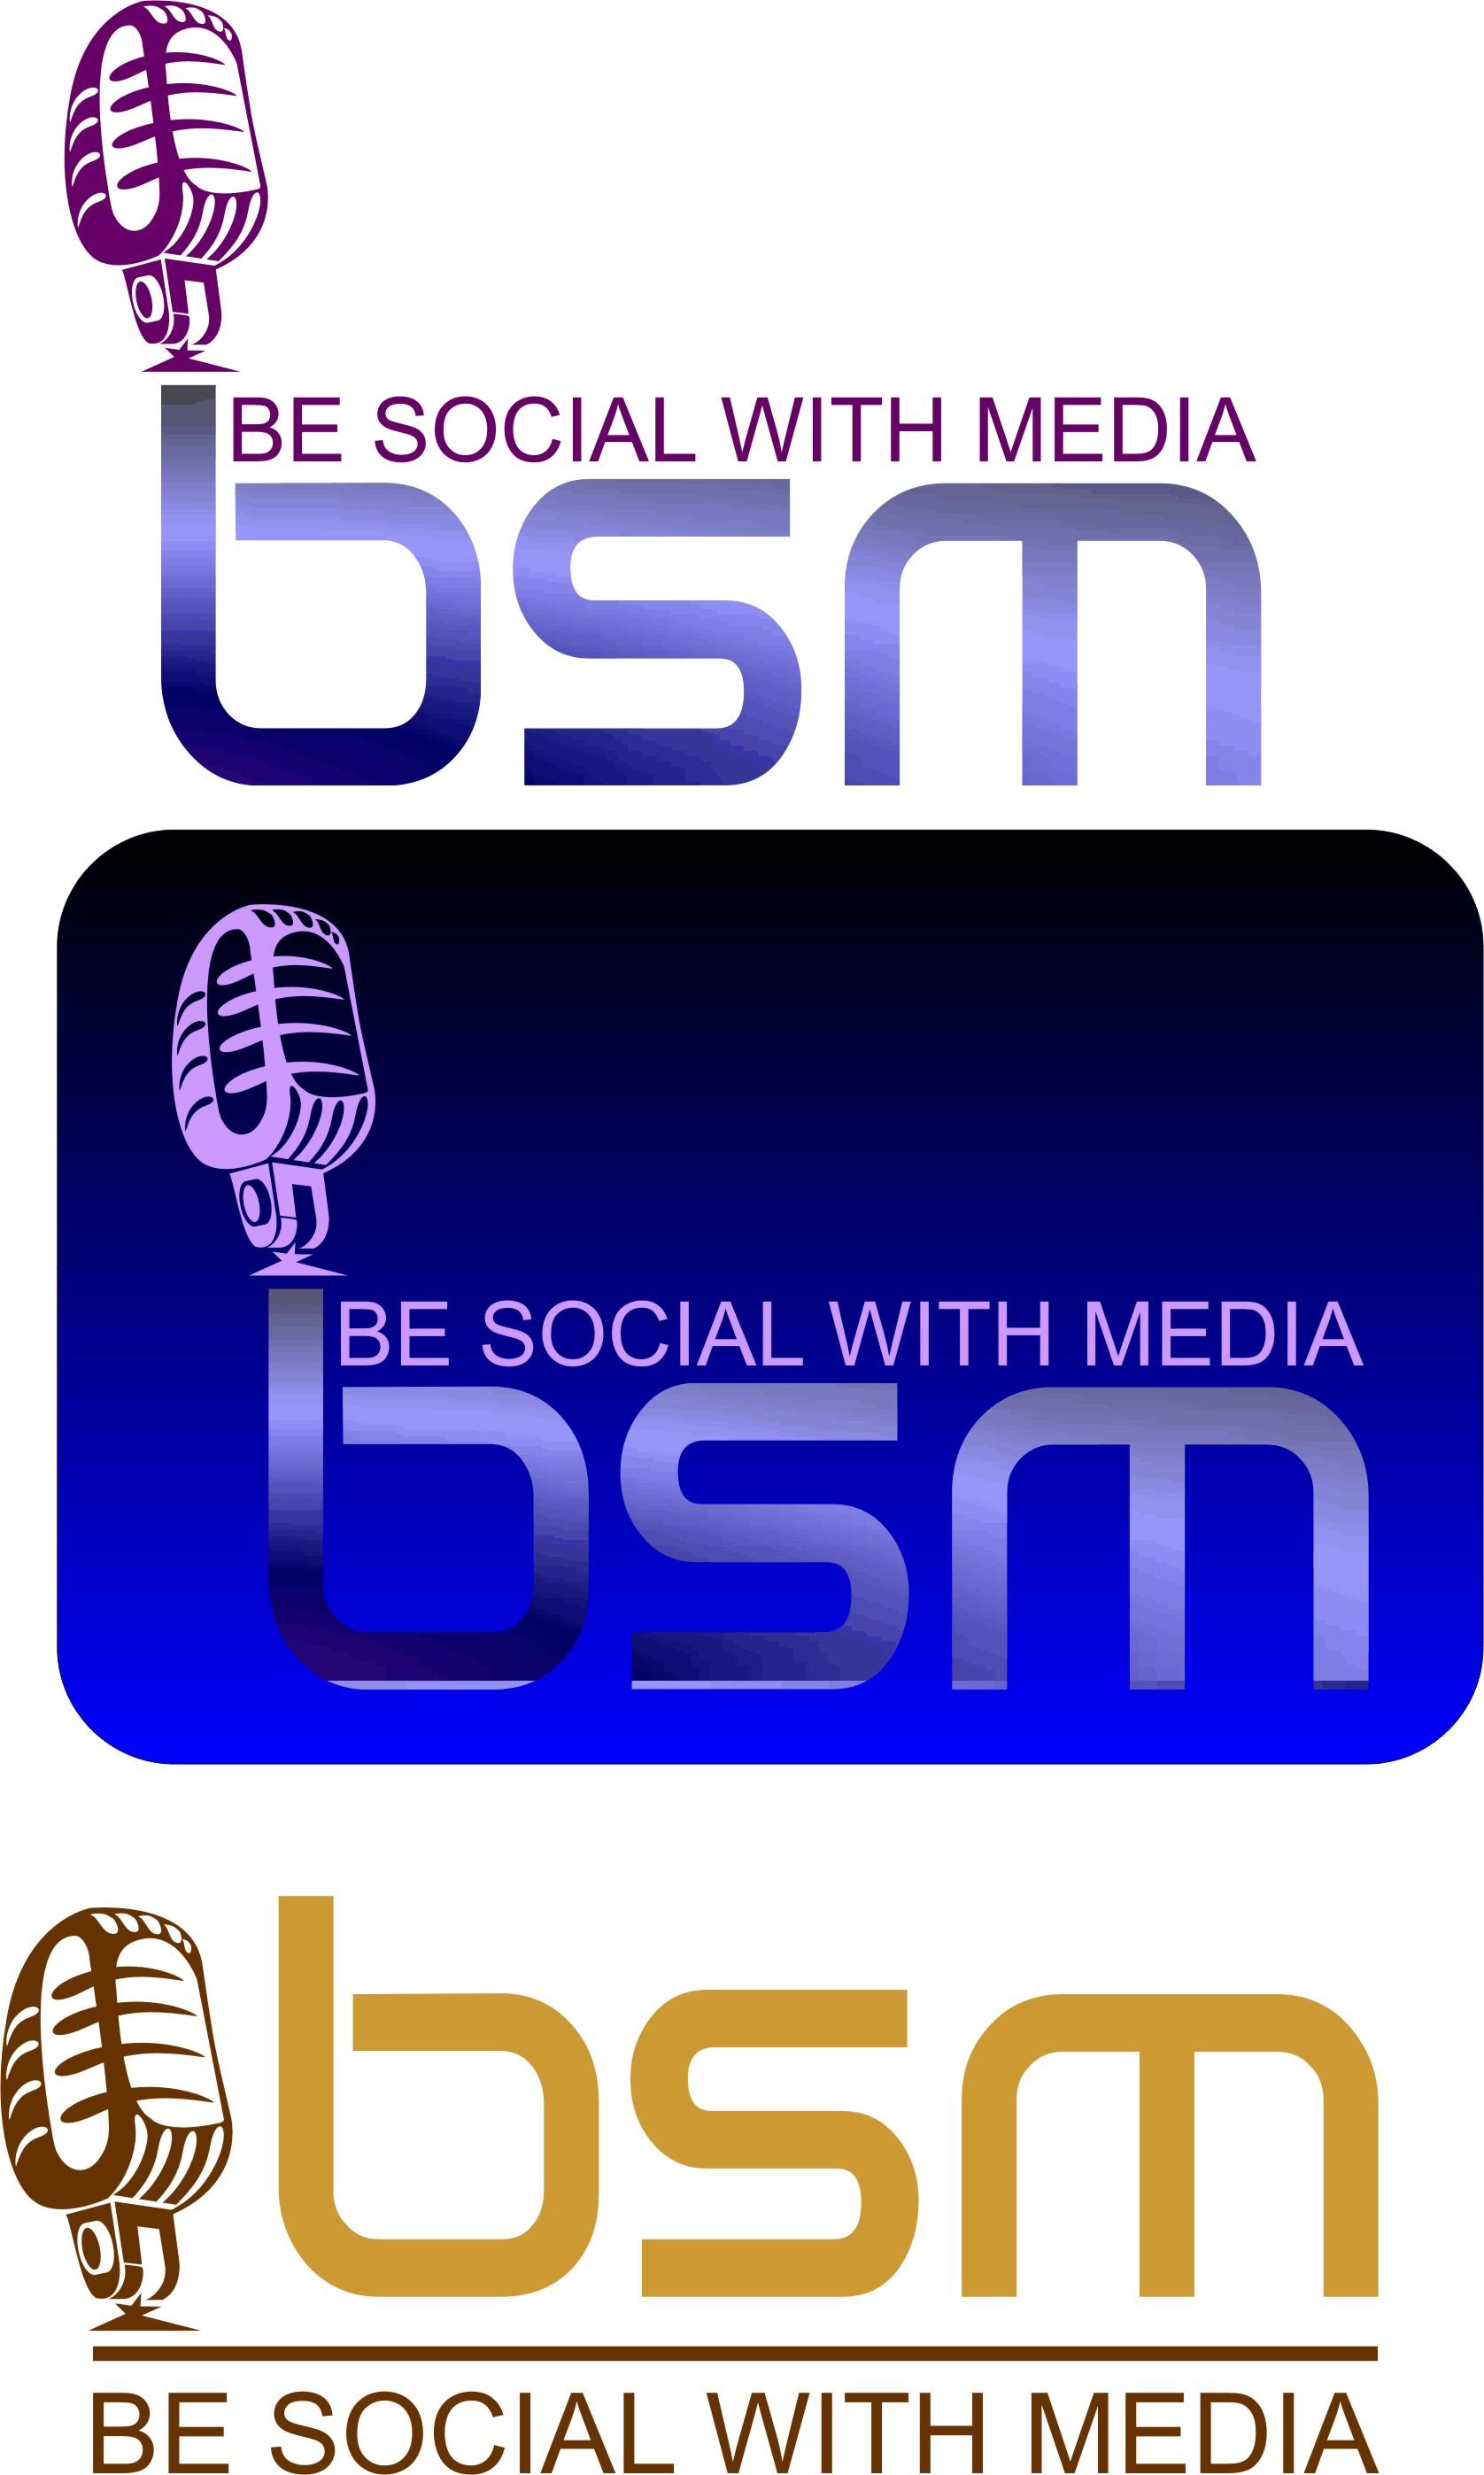 Logo Design by Korsunov Oleg - Entry No. 42 in the Logo Design Contest Imaginative Logo Design for Be Social With Media.